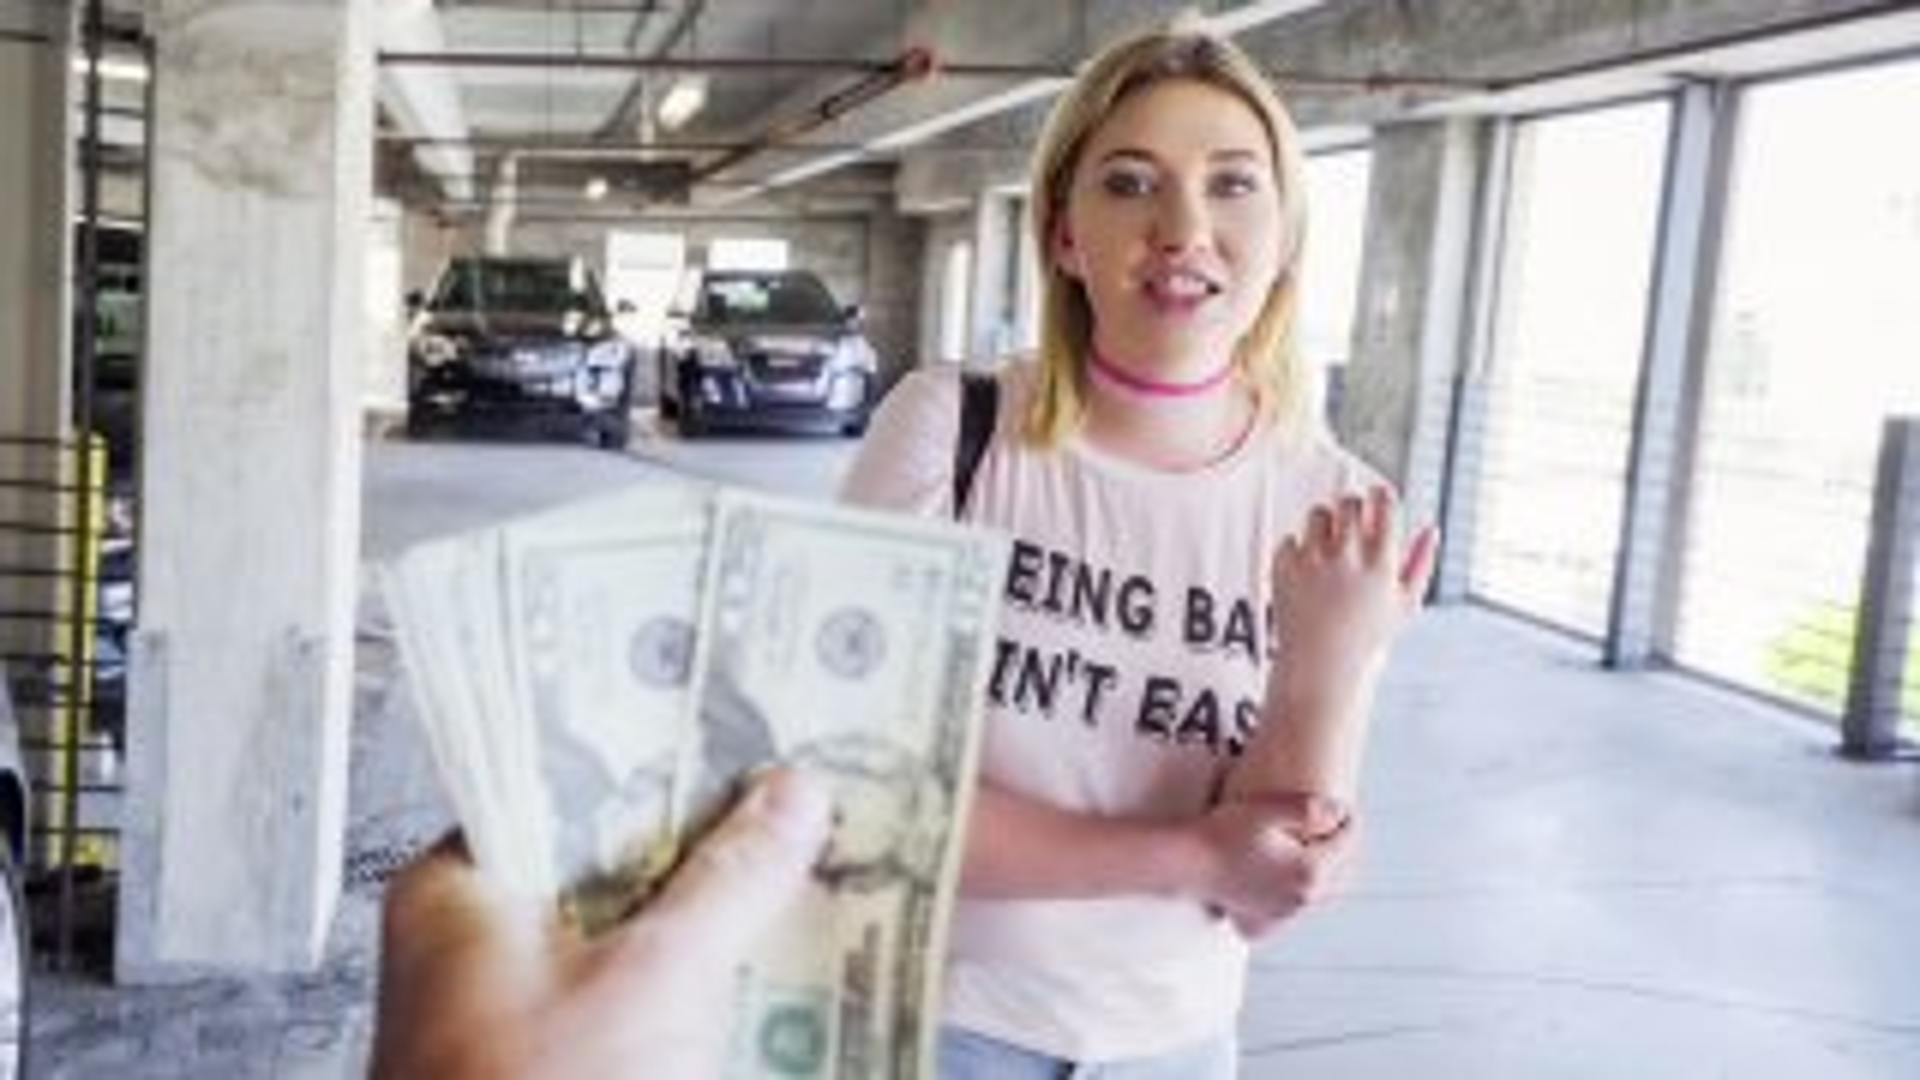 Saucy Blonde Fucks for Money - Public Pickups